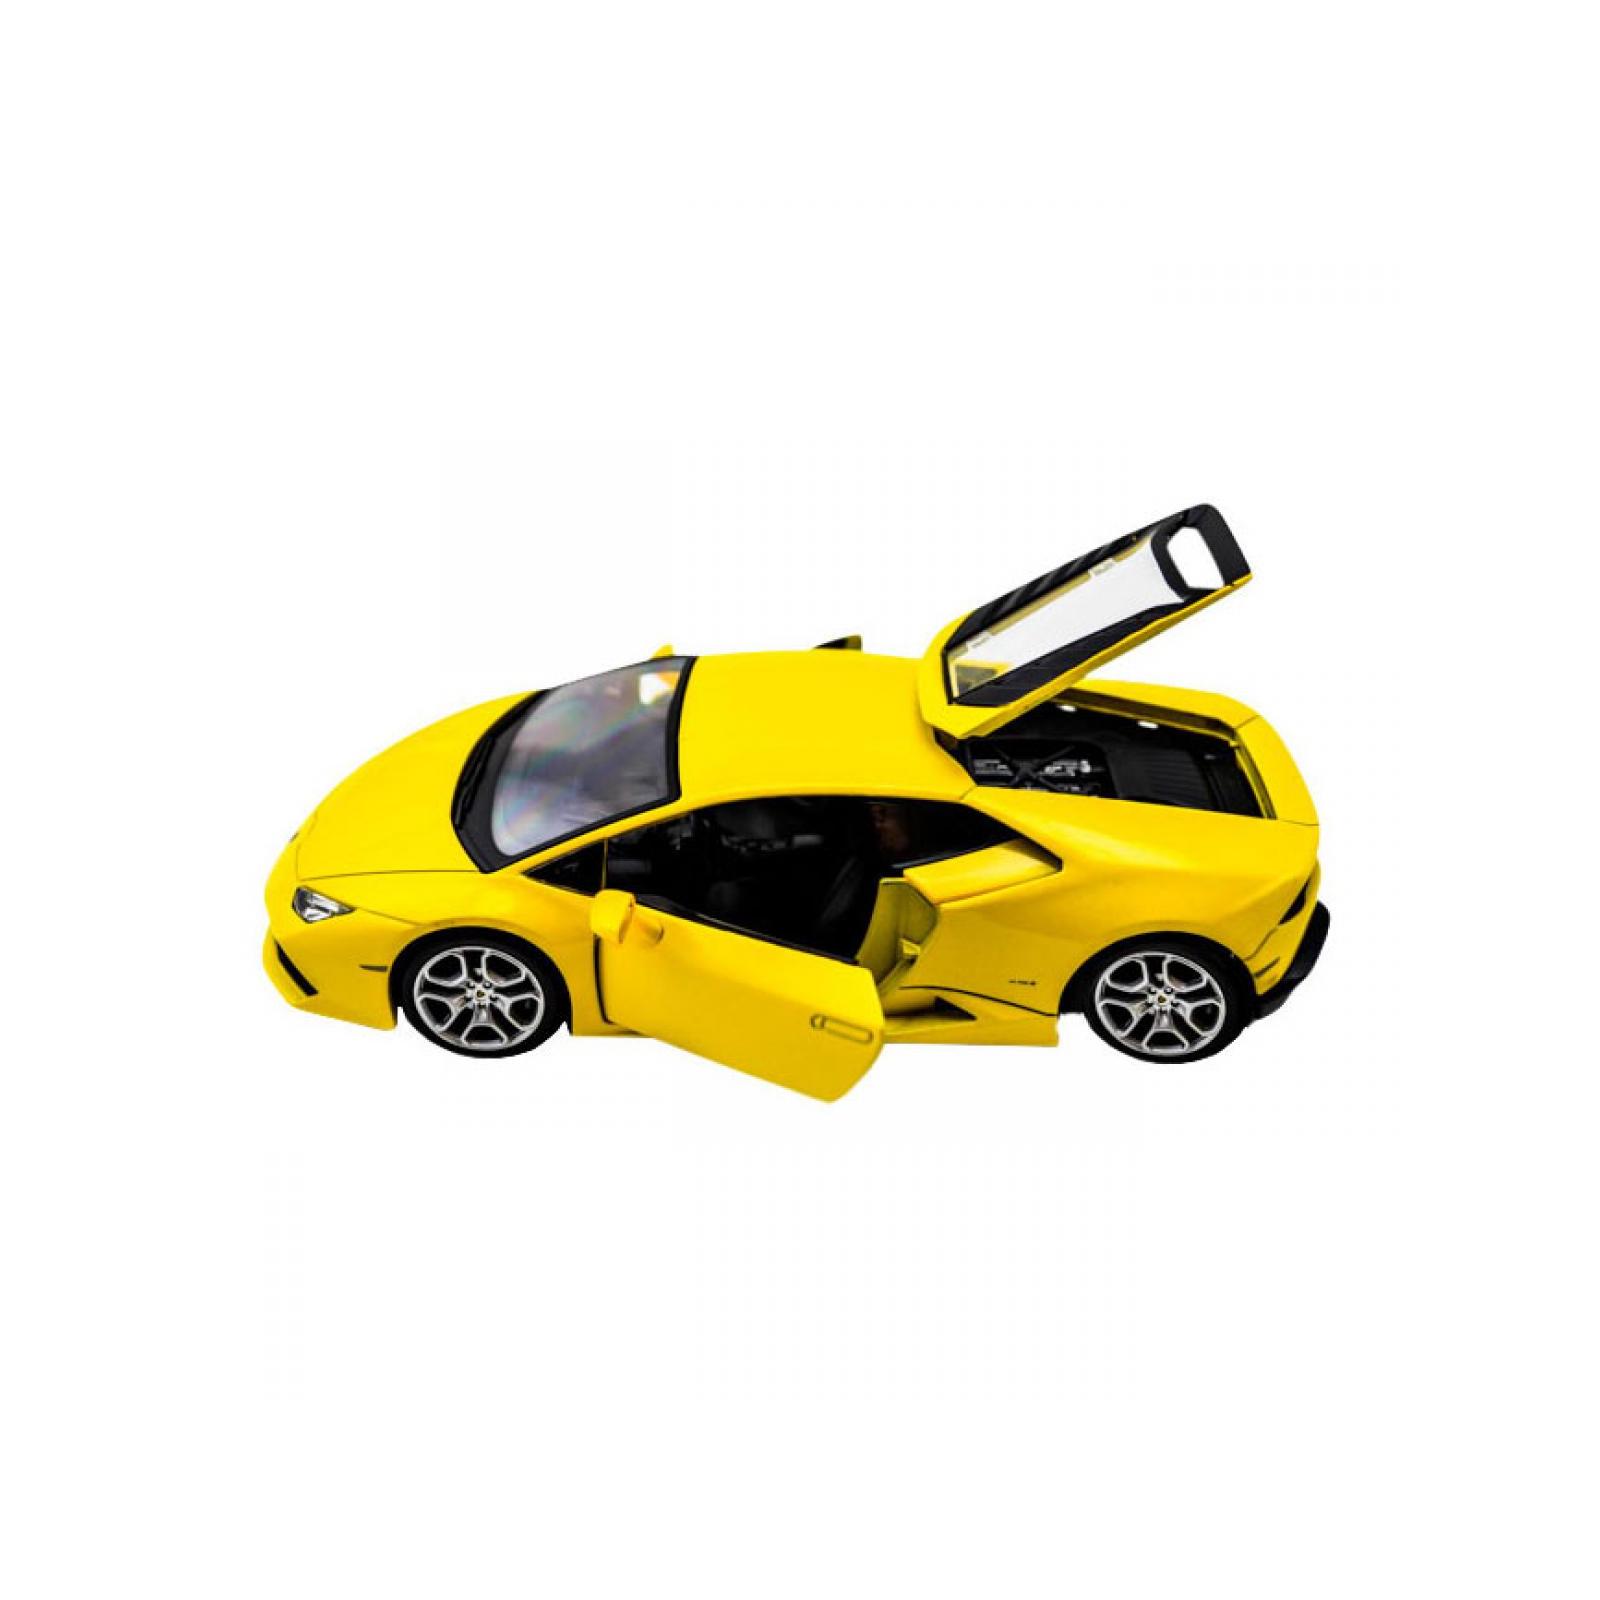 Машина Maisto Lamborghini Huracan LP 610-4 (1:24) желтый (31509 yellow) изображение 3